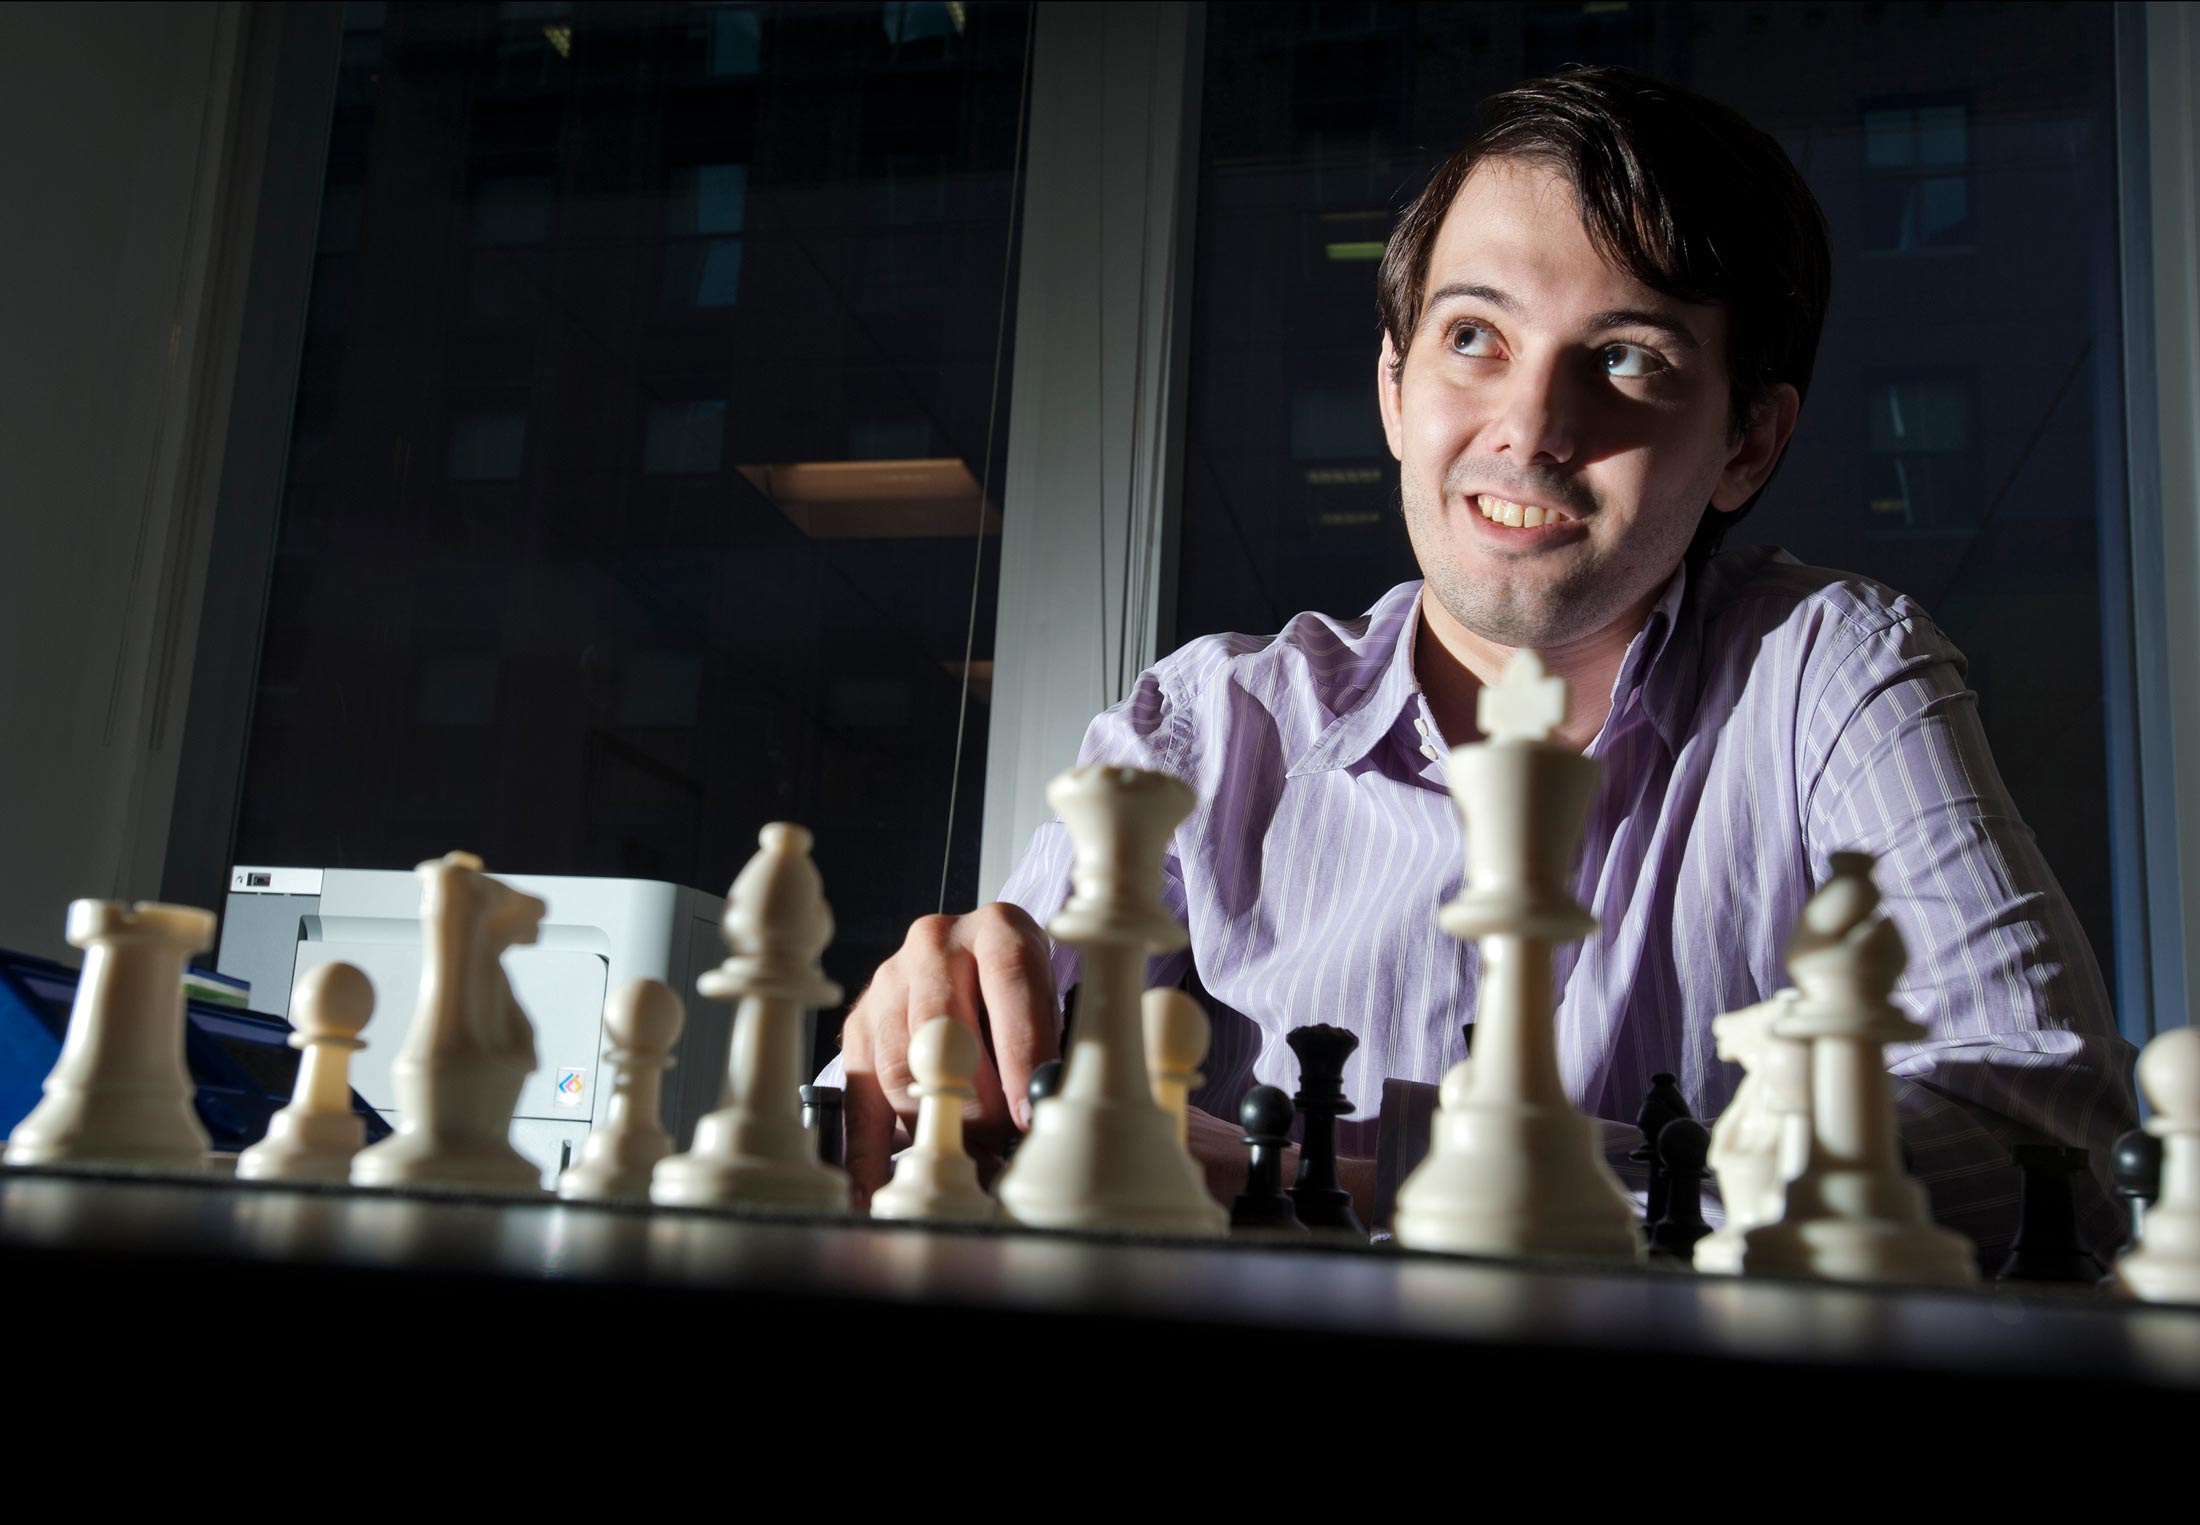 Chess savant homeless